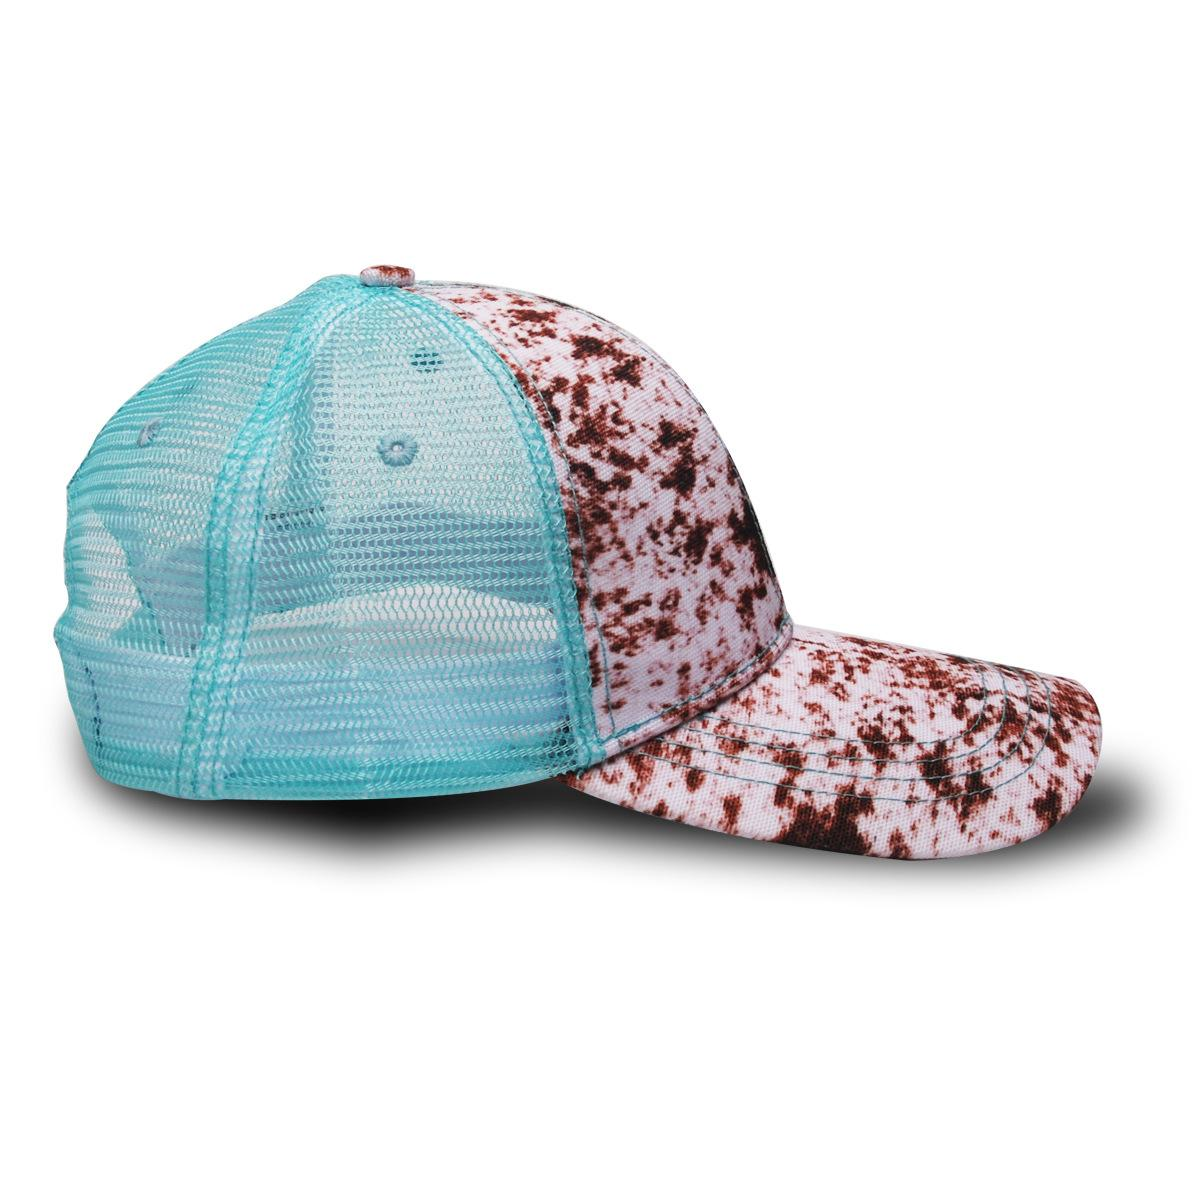 sunflower Snake Baseball Hat Cow Print Leopard Sunflower Caps Serape Mesh Cap Fashion Striped cactus Hats Outdoor Sunhat BWA1225